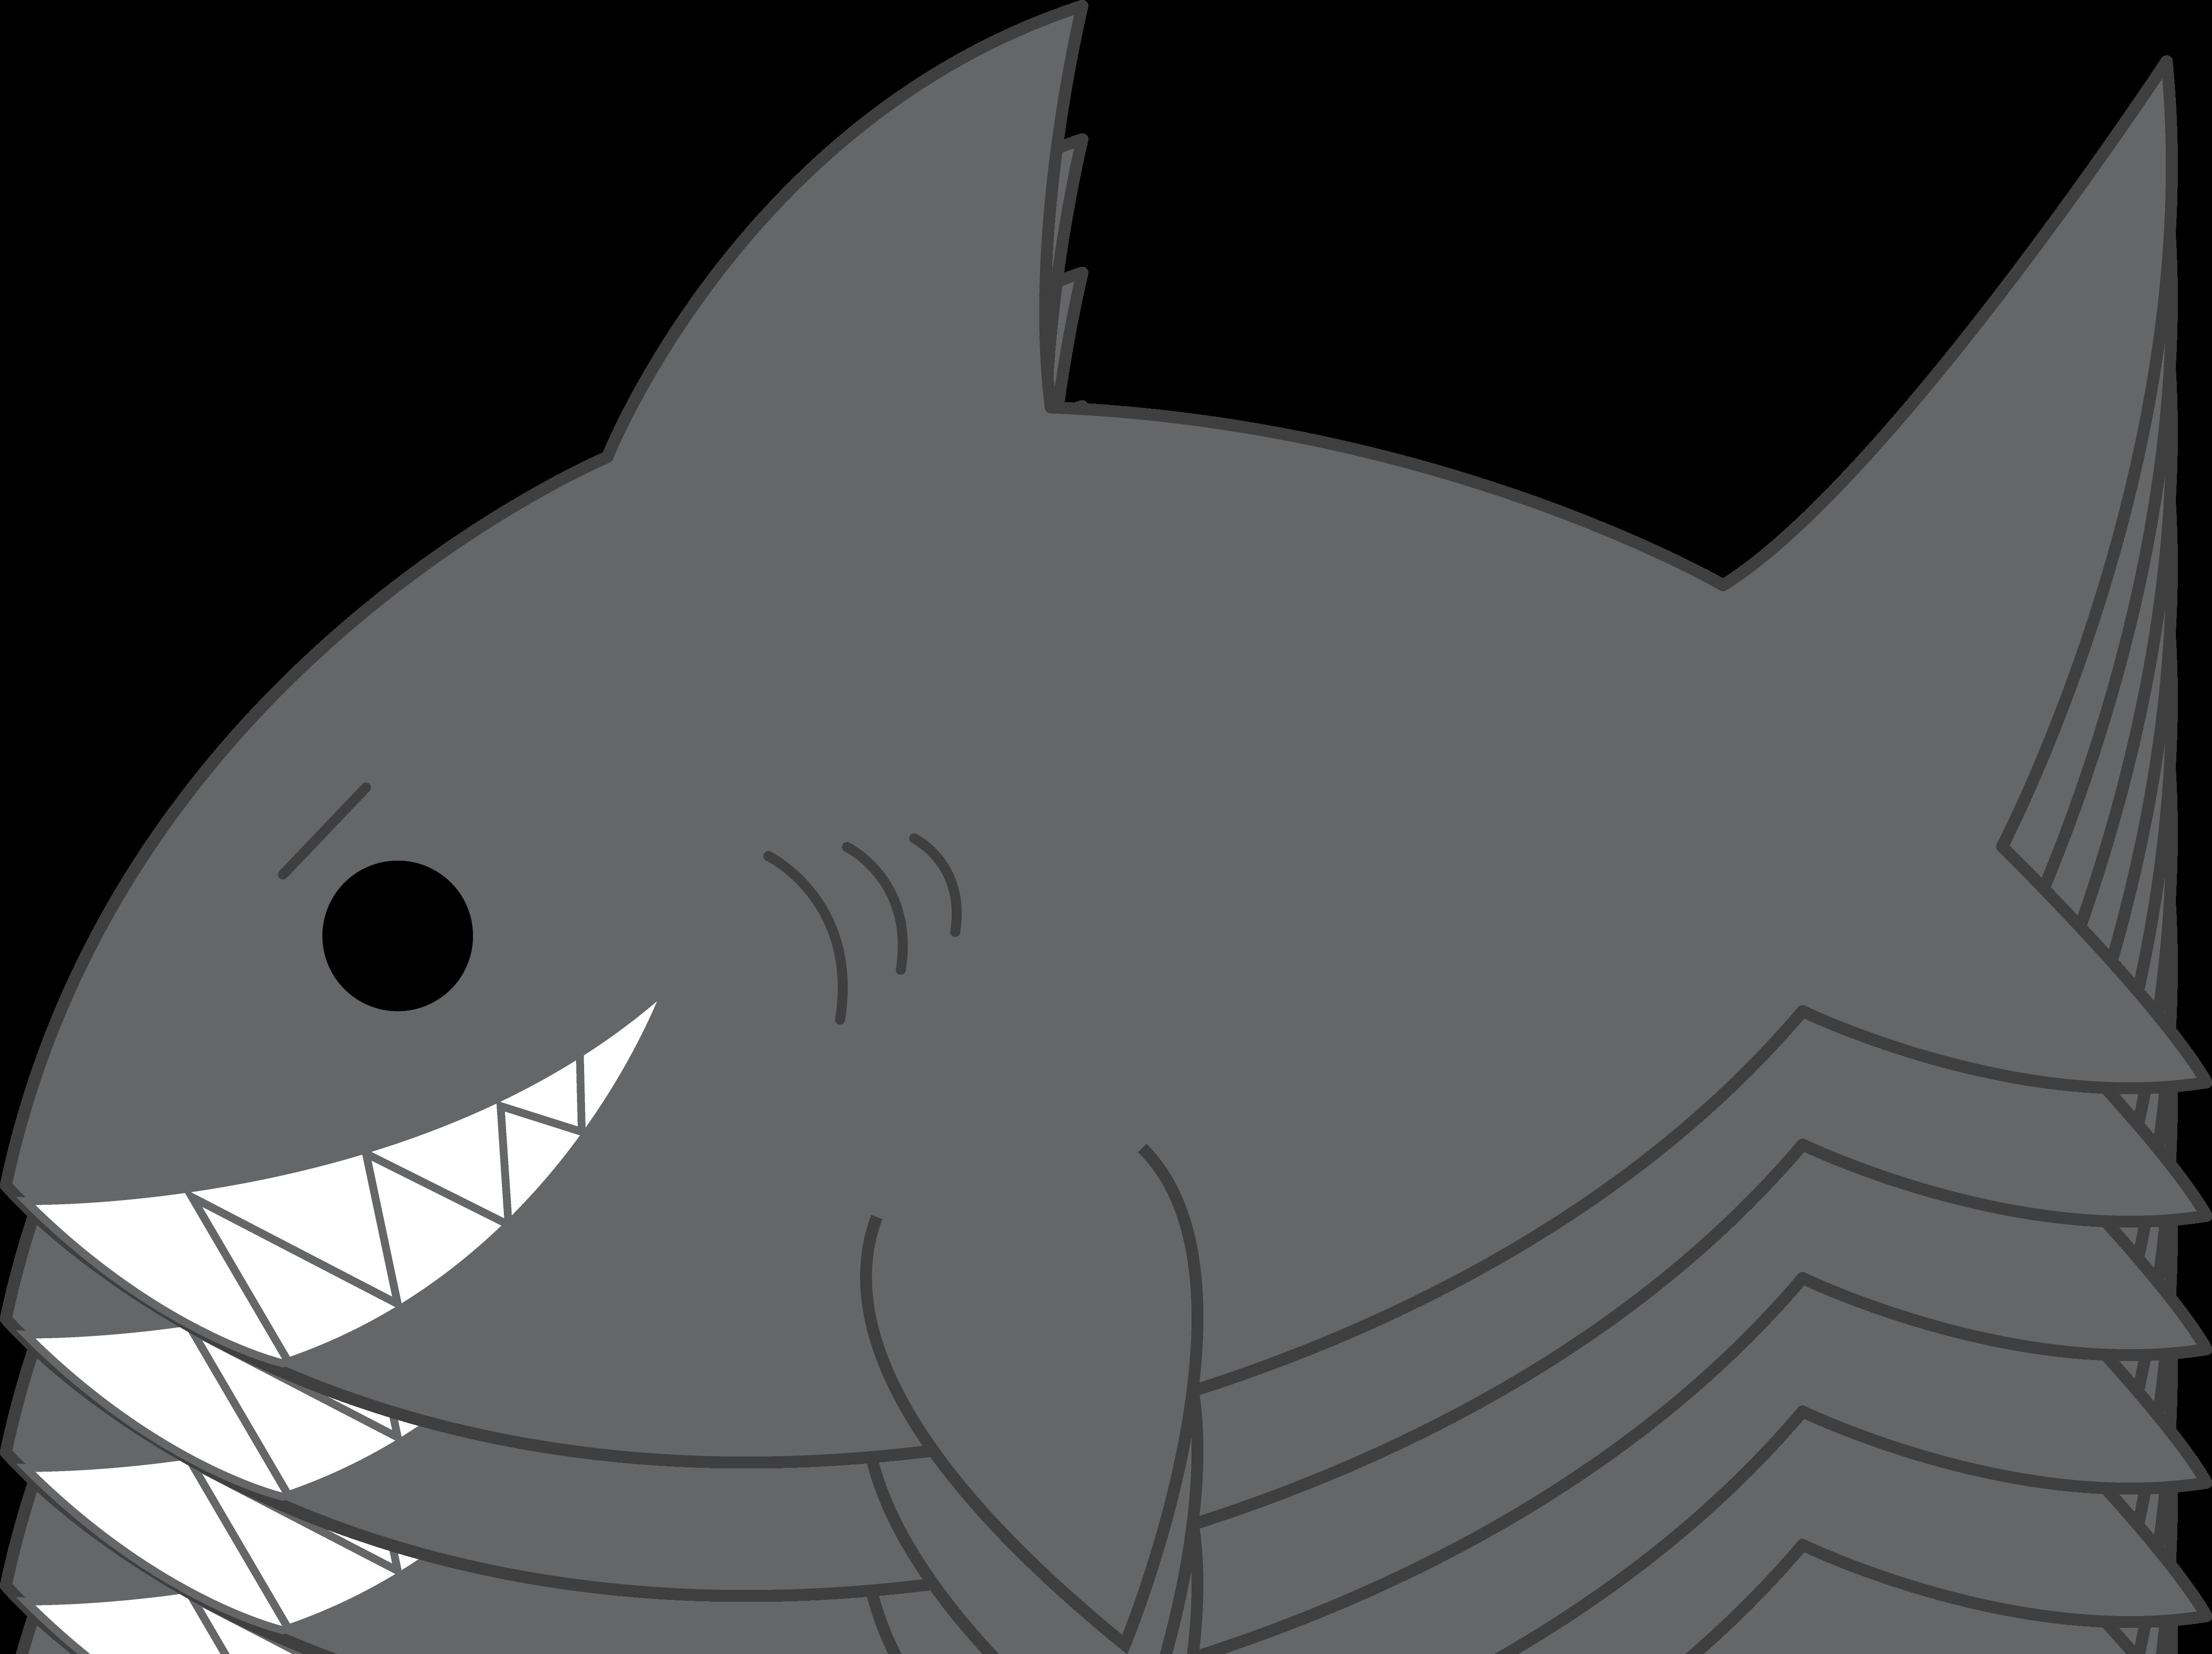 Shark clipart #19, Download drawings